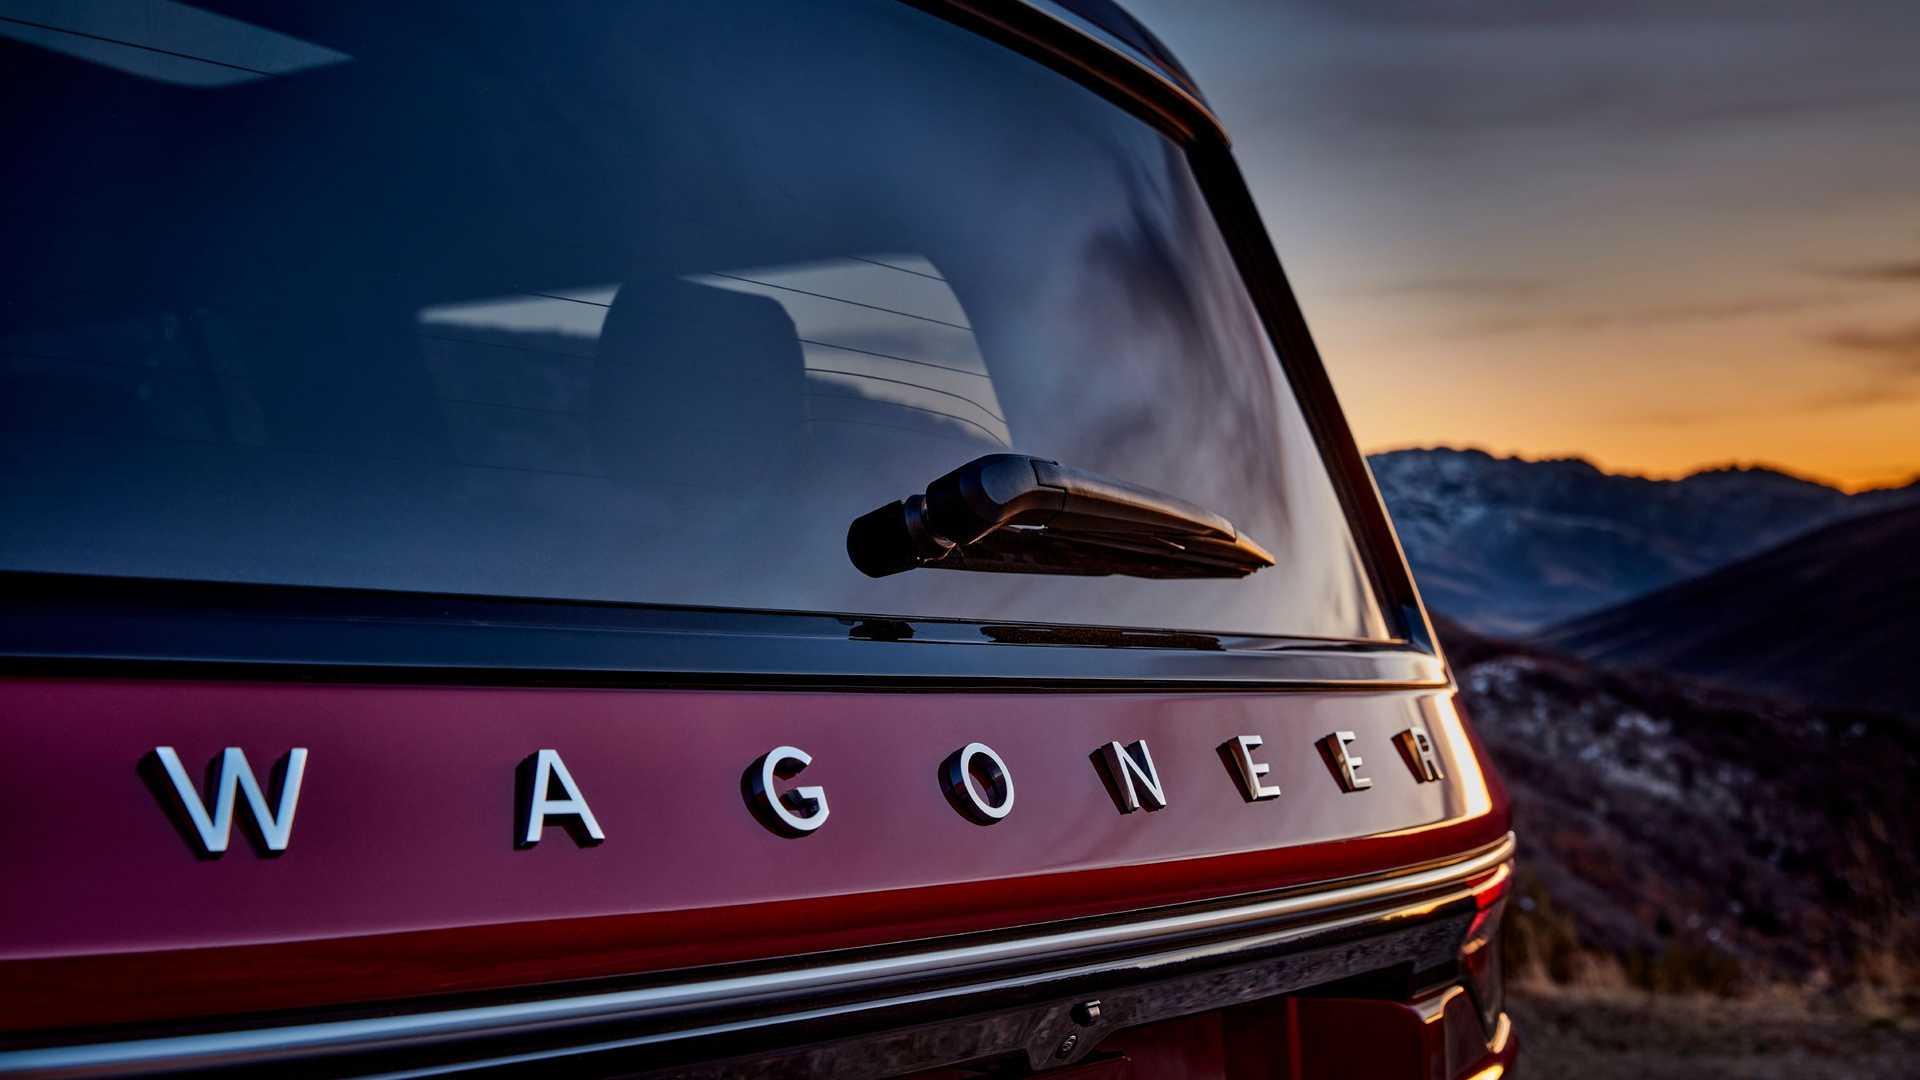 2022-jeep-wagoneer-exterior-badging-2